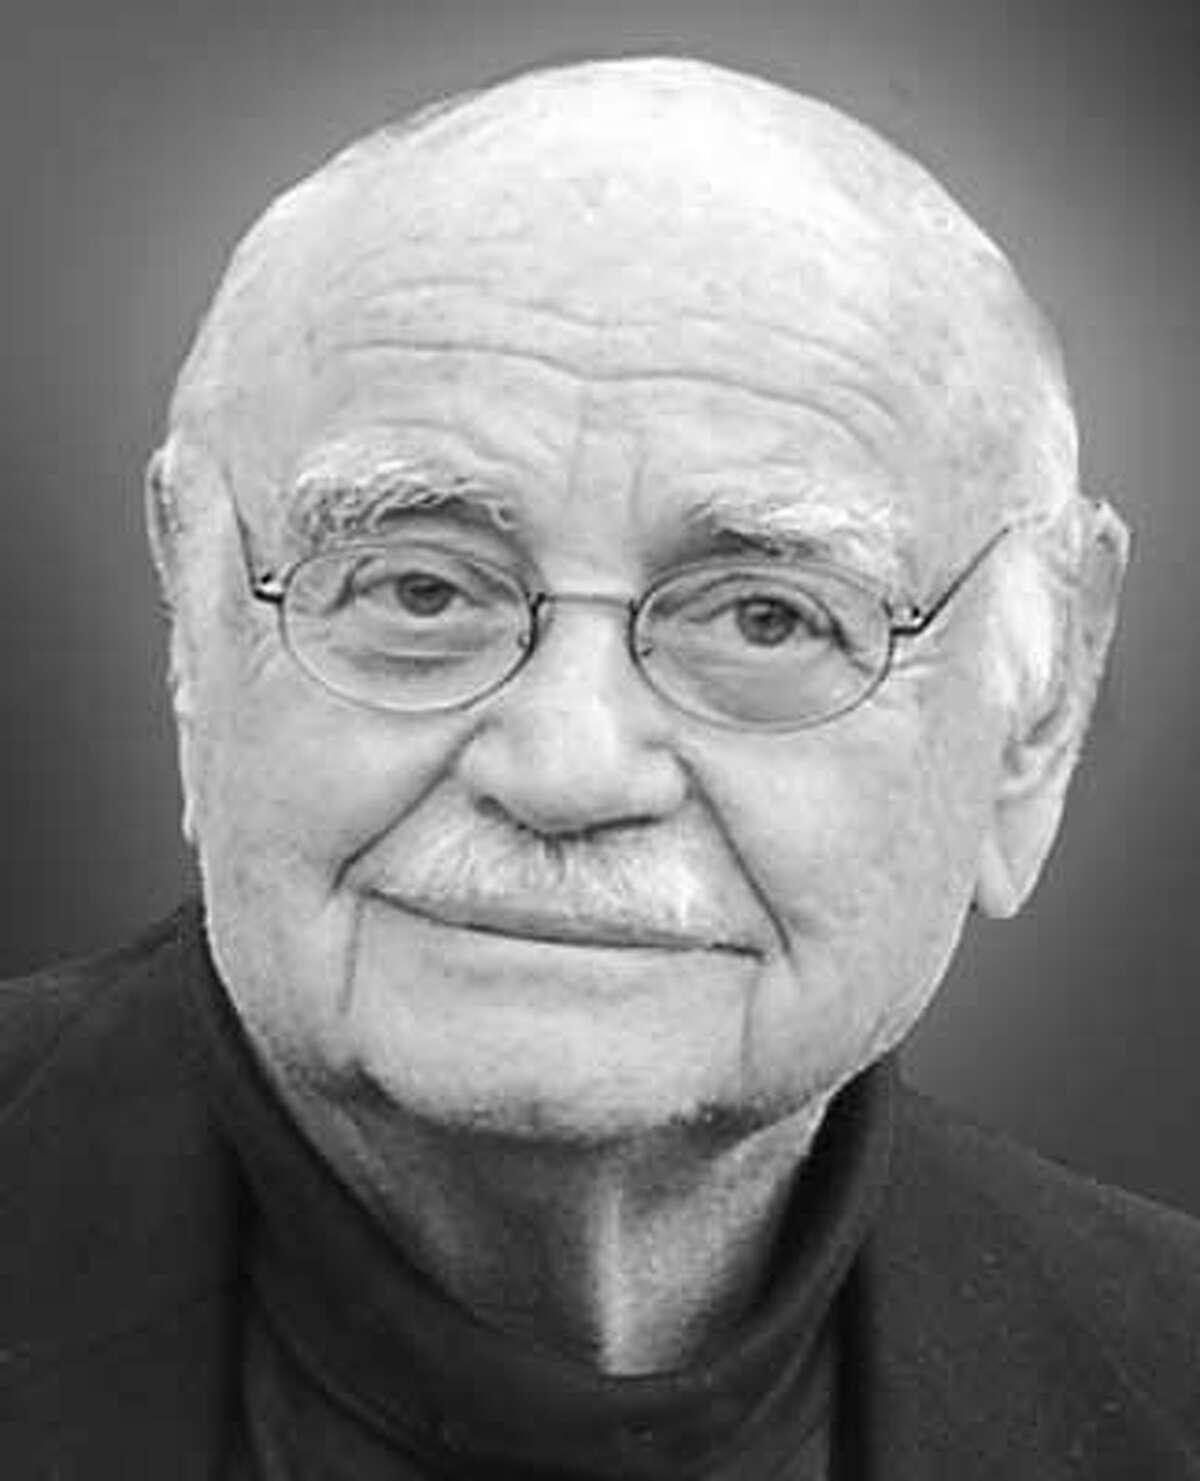 Obituary photo of Harry Wilmer.